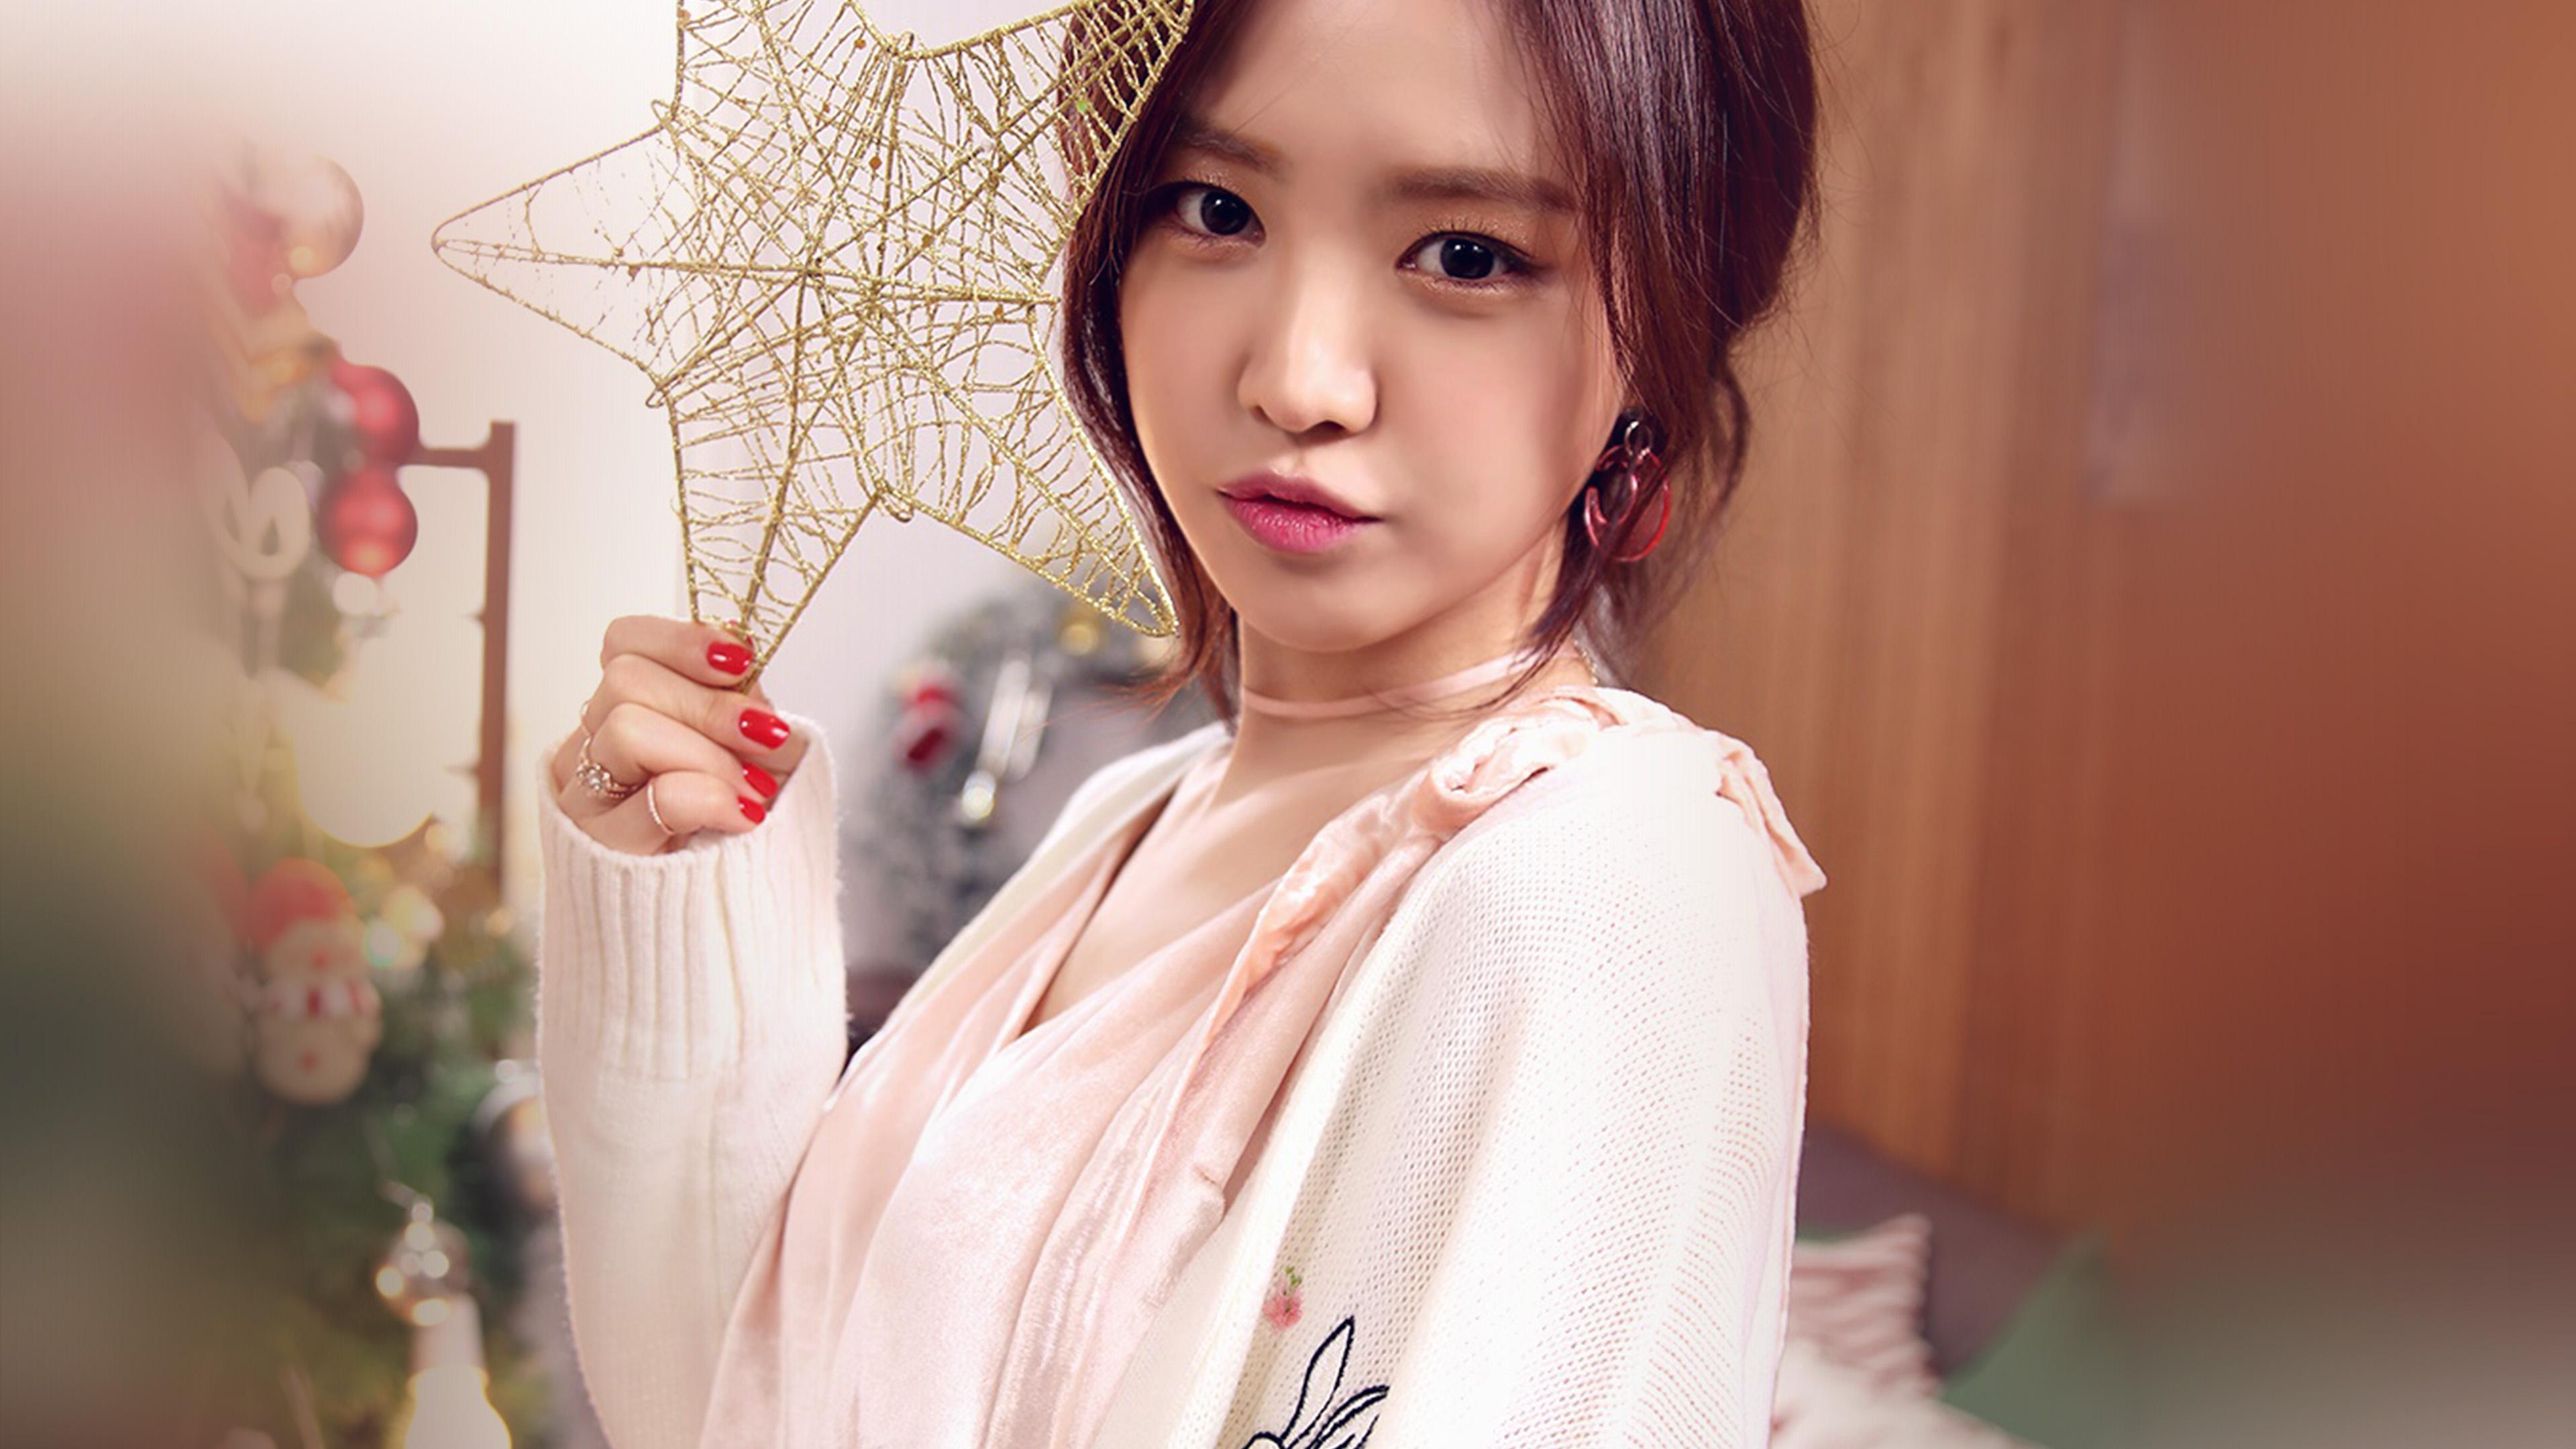 Hl46 Kpop Girl Cute Christmas Apink Wallpaper